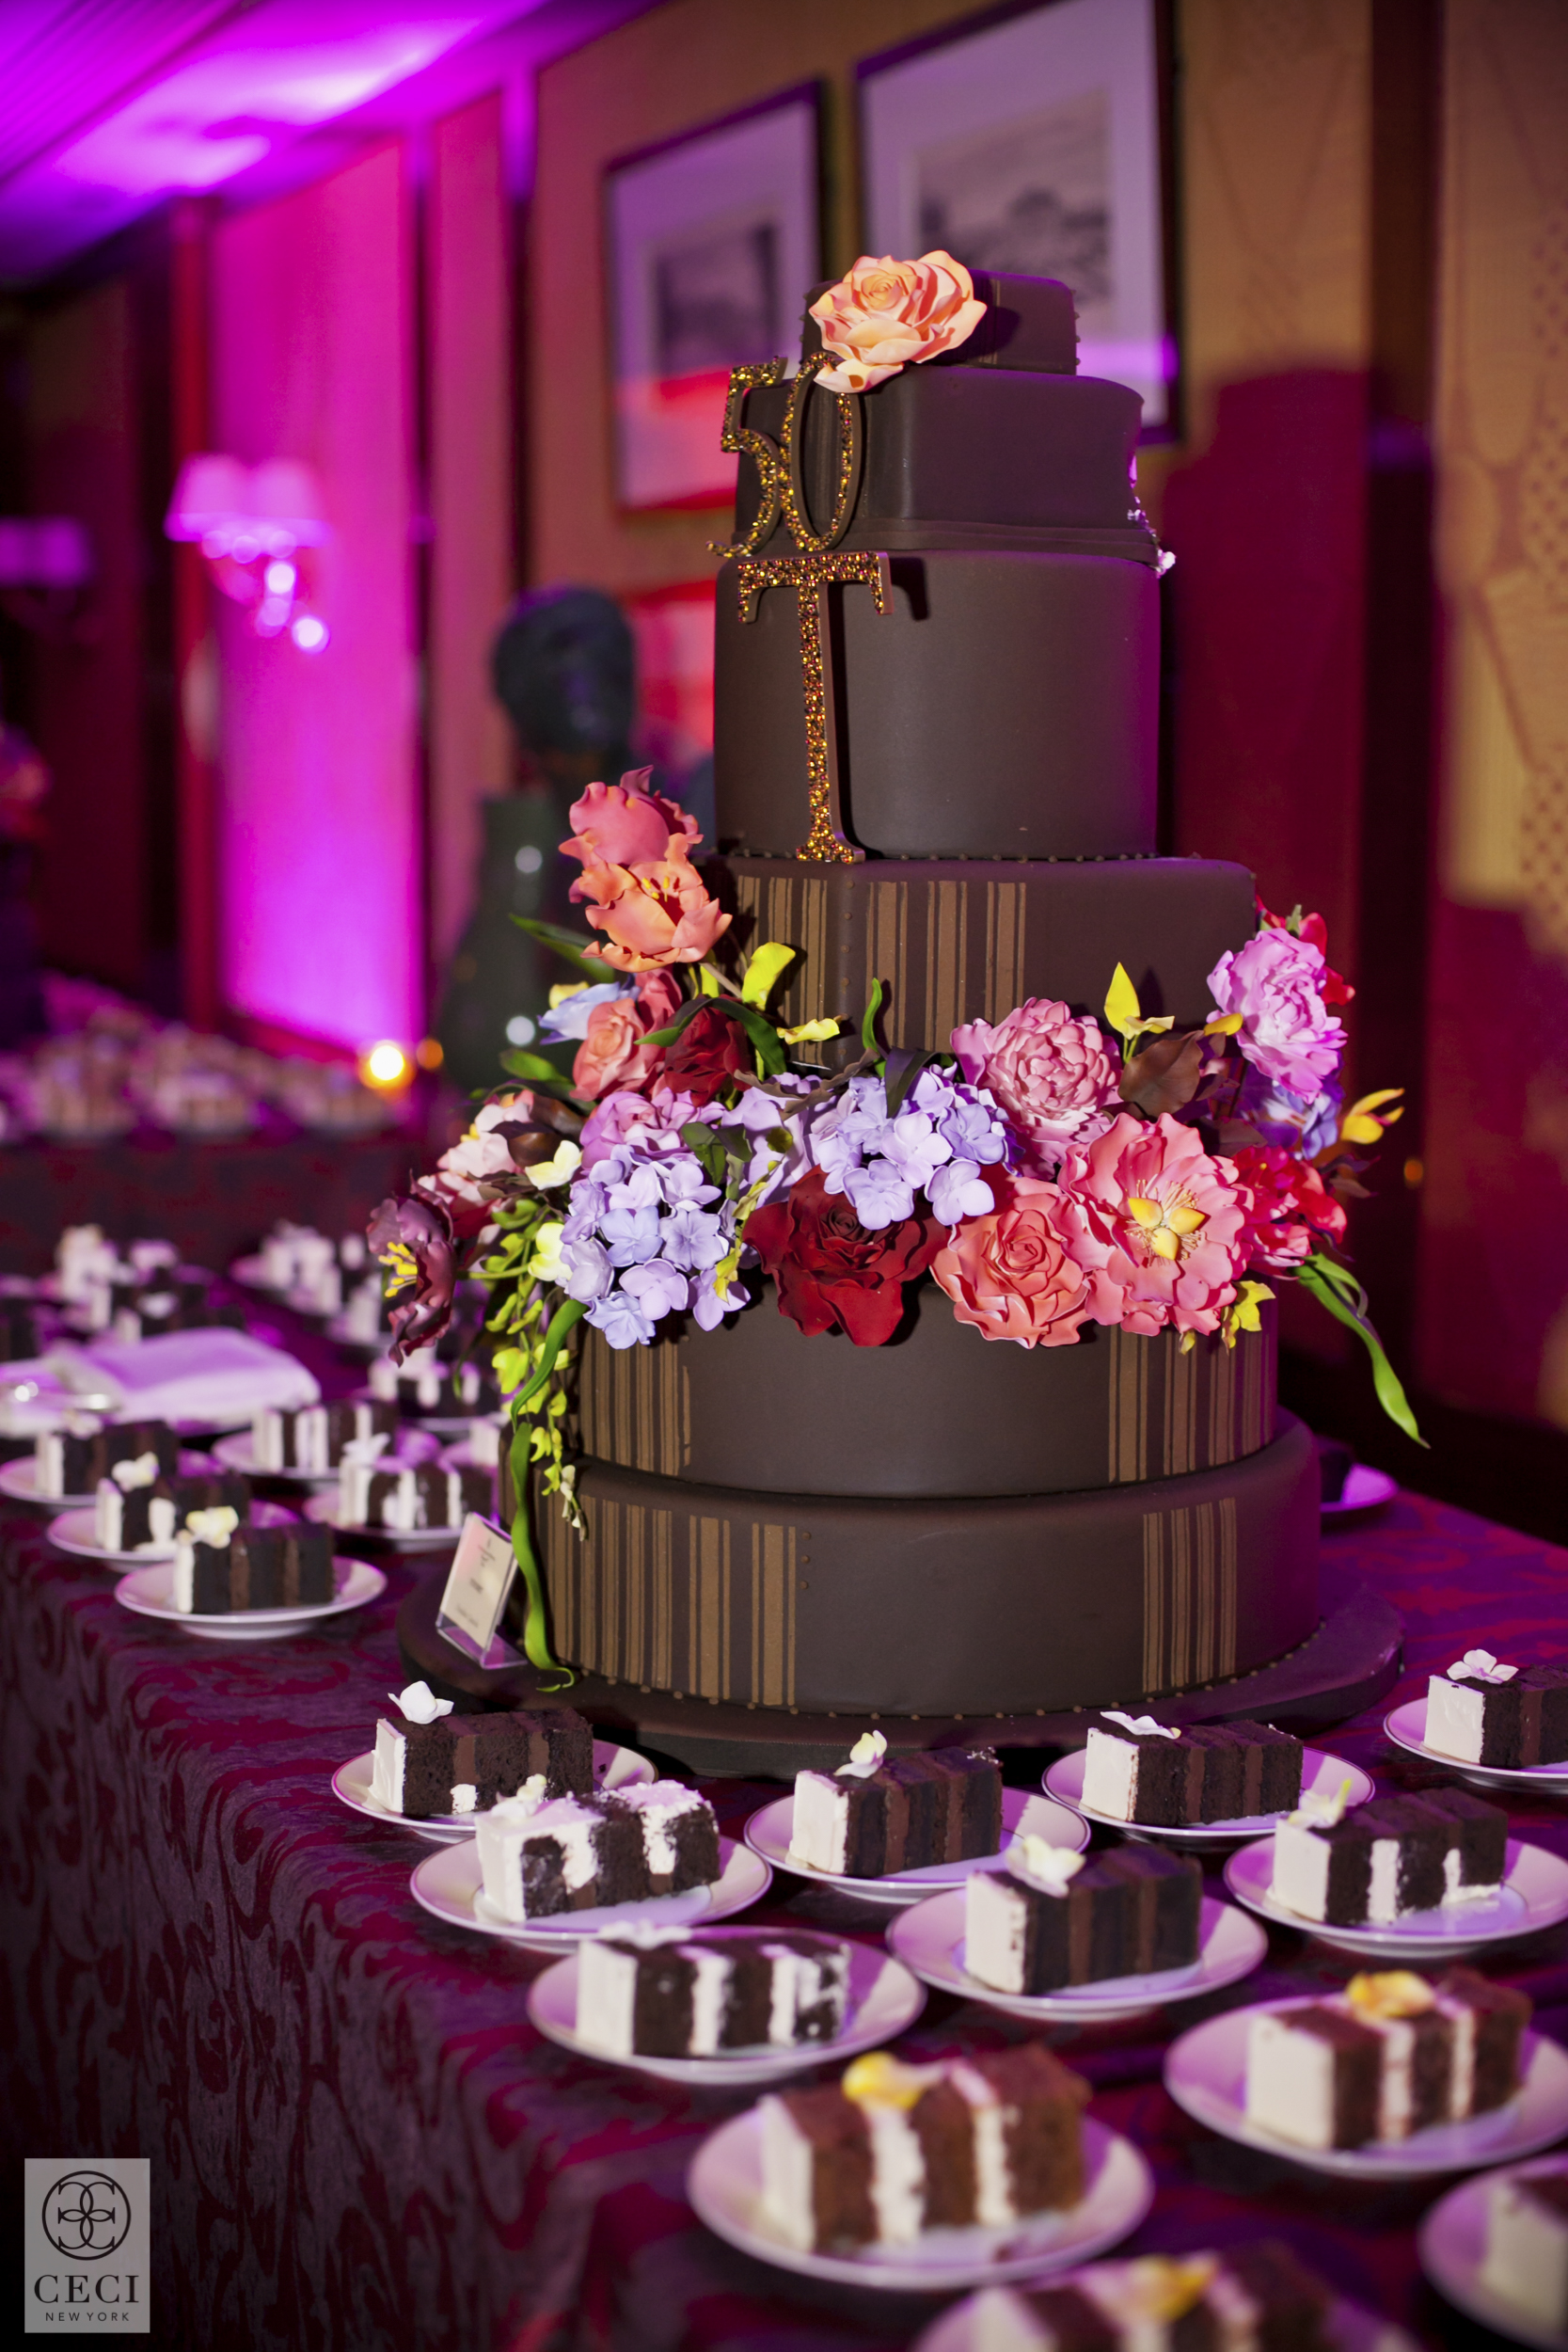 ceci_new_york_lucas_somoza_purple_regal_wediding_birthday_commitment_ceremony_gold-38.jpg